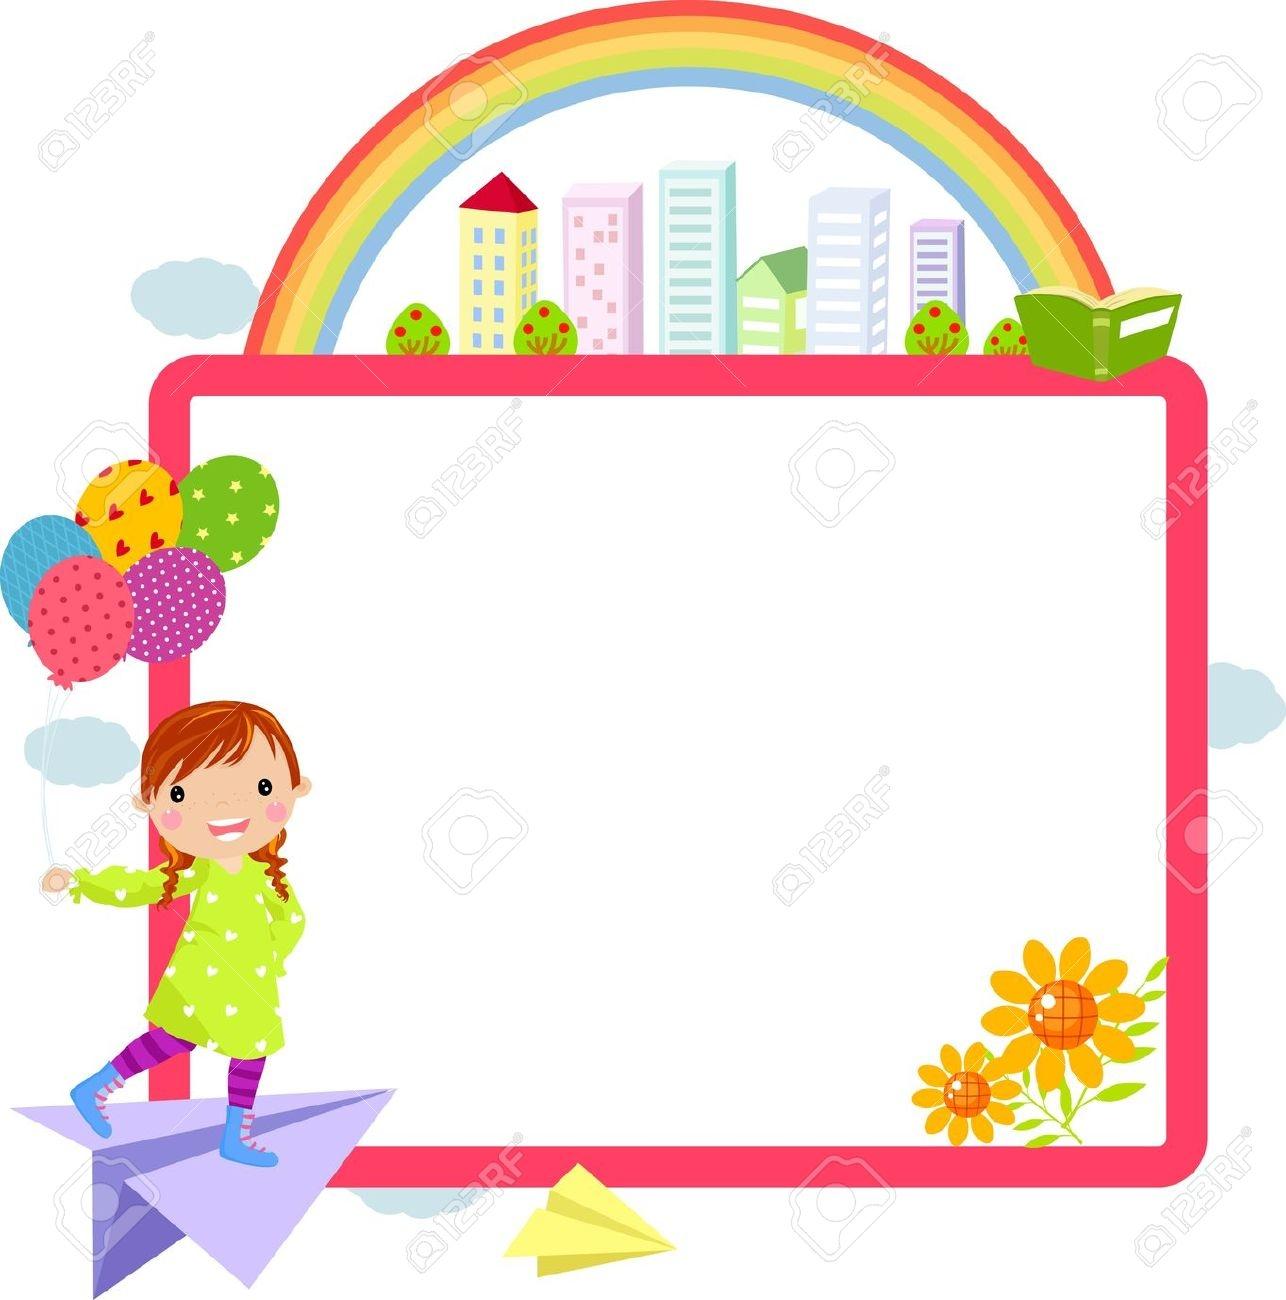 1286x1300 Cute School Clipart Horizontal Border